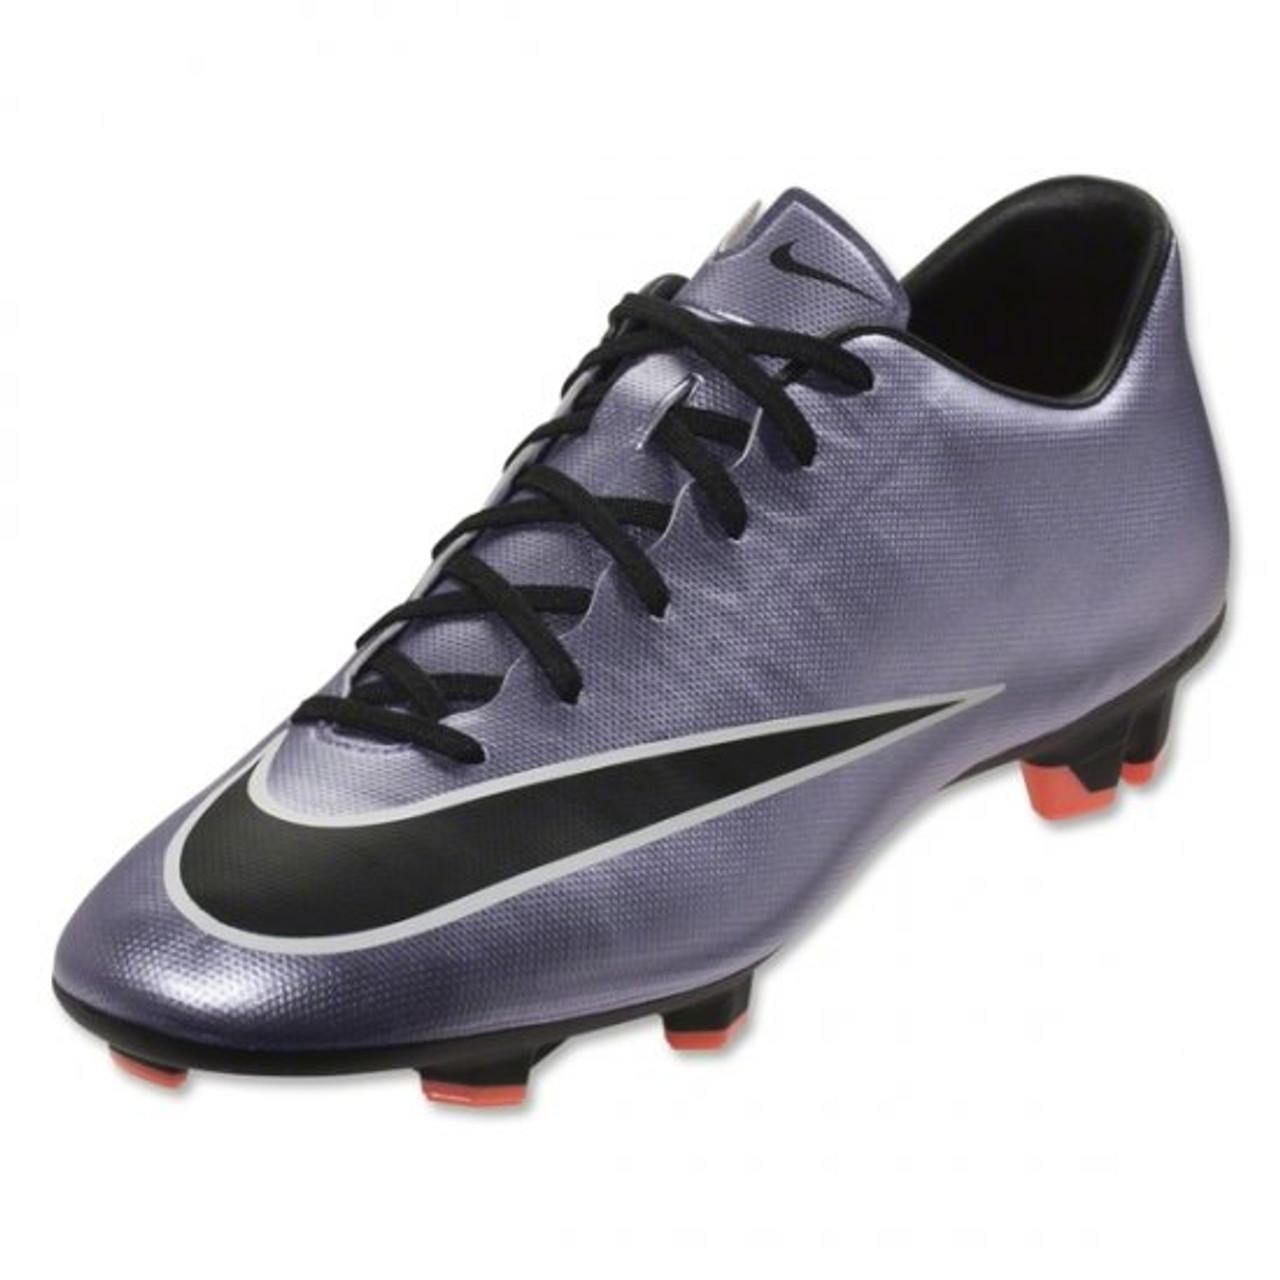 52640f7d916 Nike Mercurial Victory V FG - Urban Lilac Bright Mango Black - ohp soccer